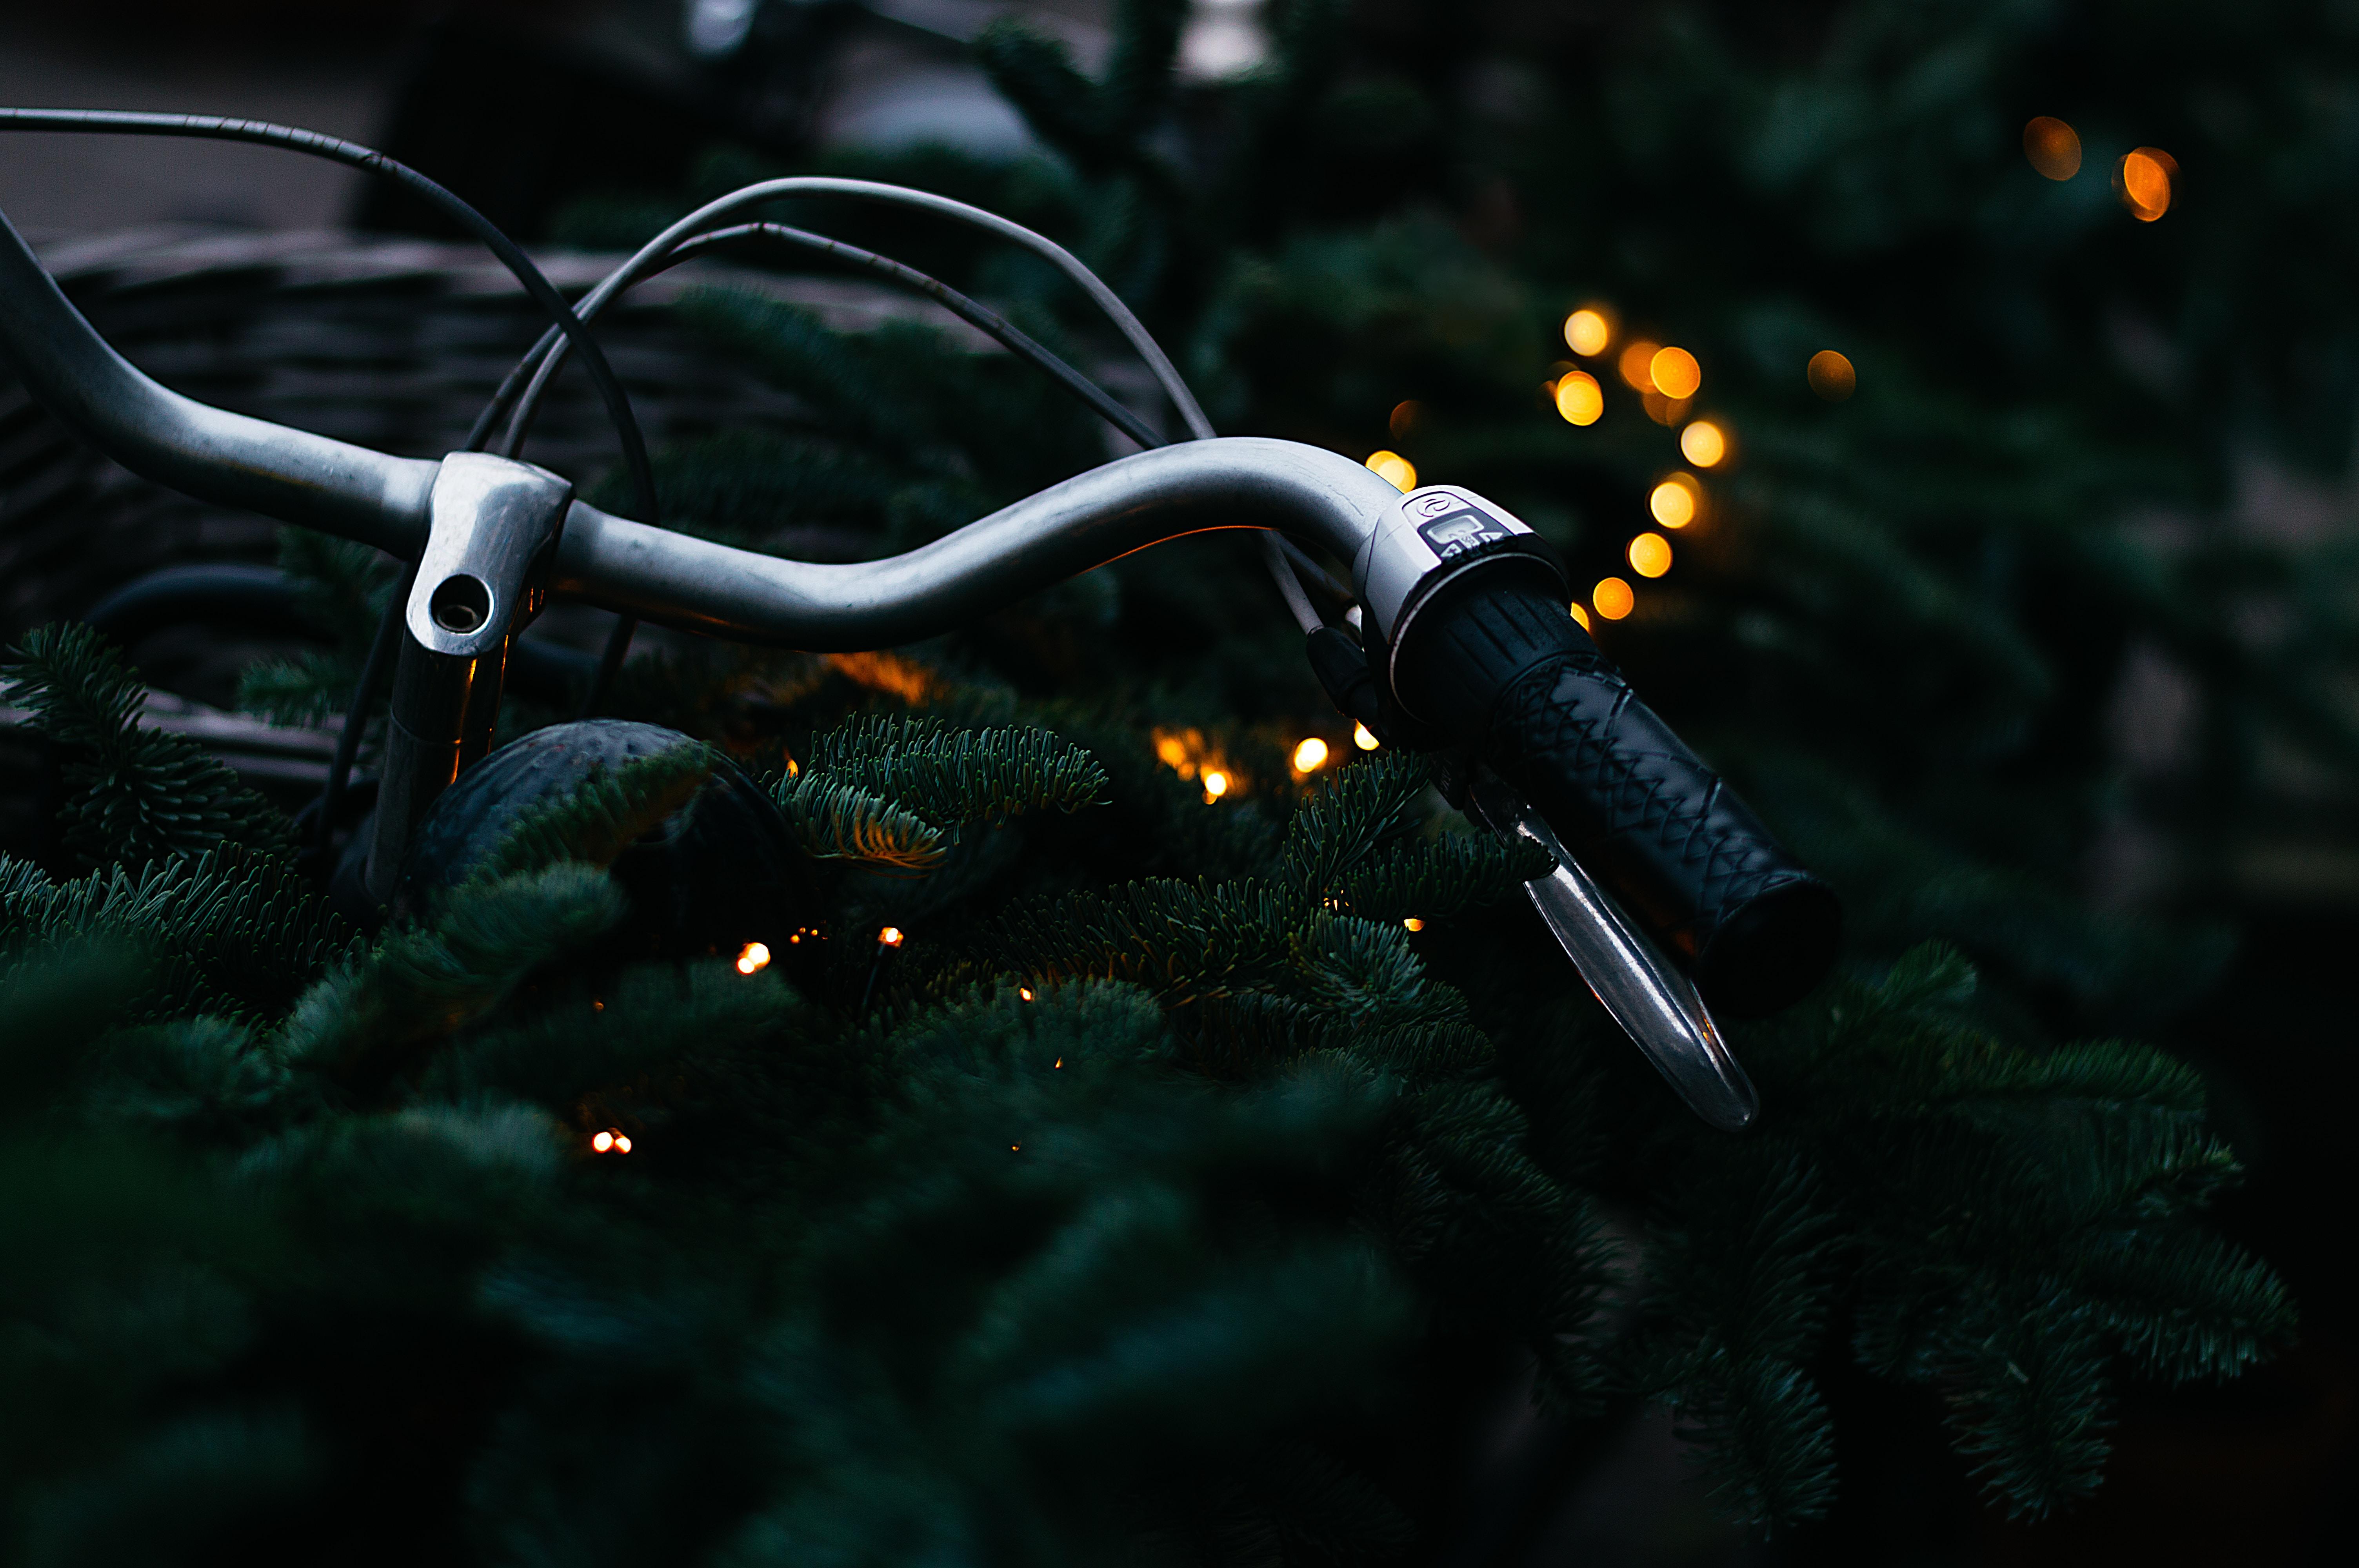 bokeh photography of gray bicycle